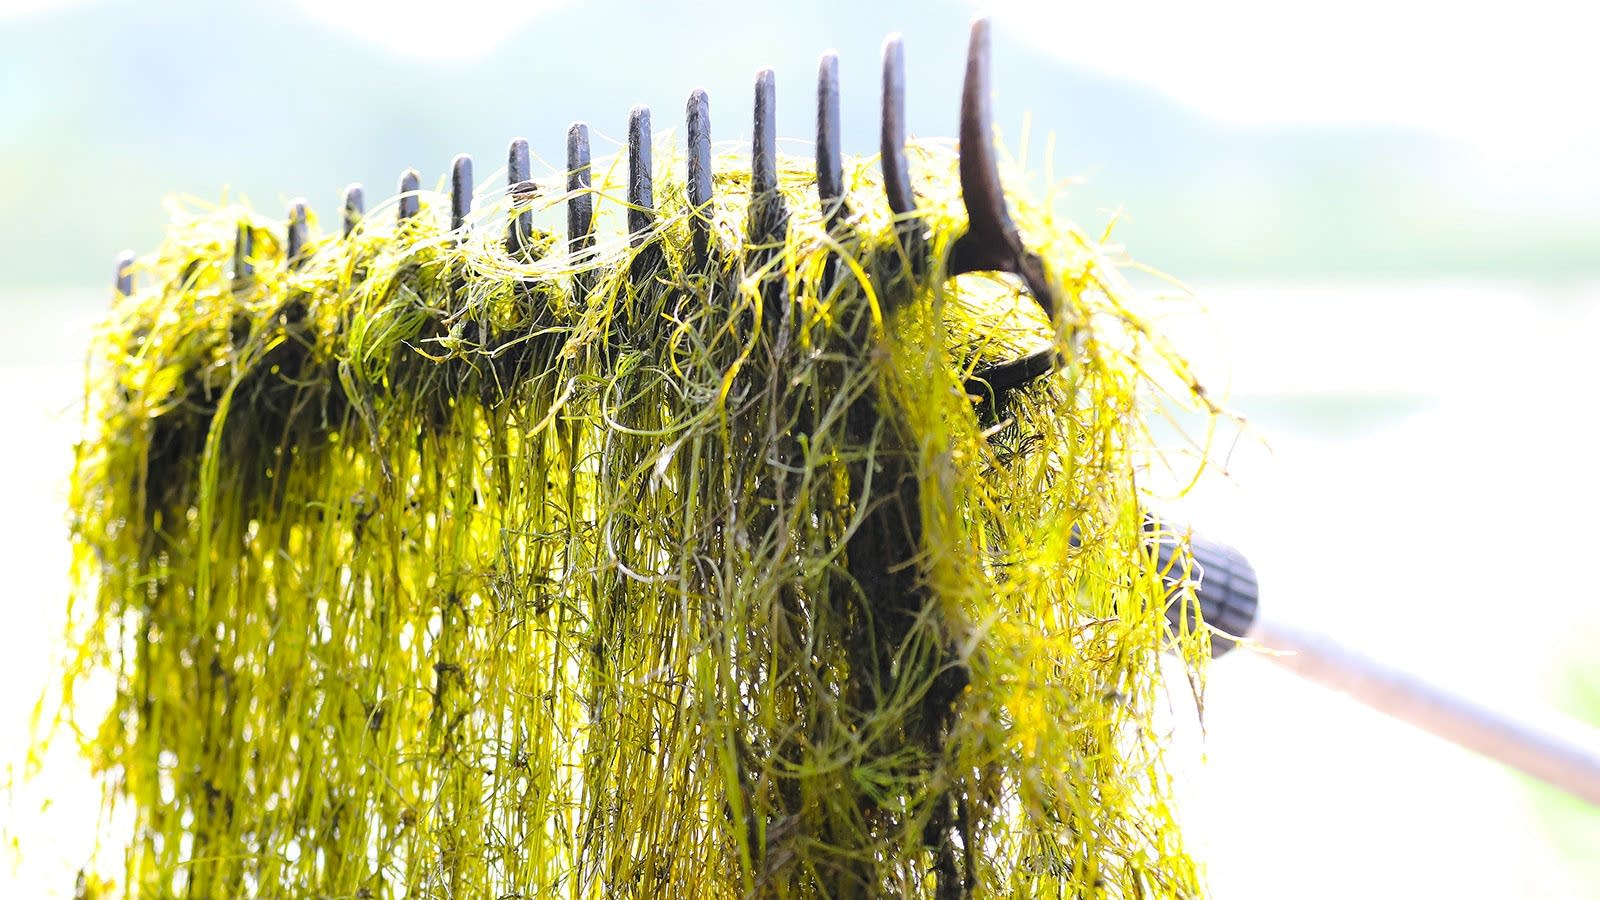 Mats of starry stonewort have infested Lake Koronis.